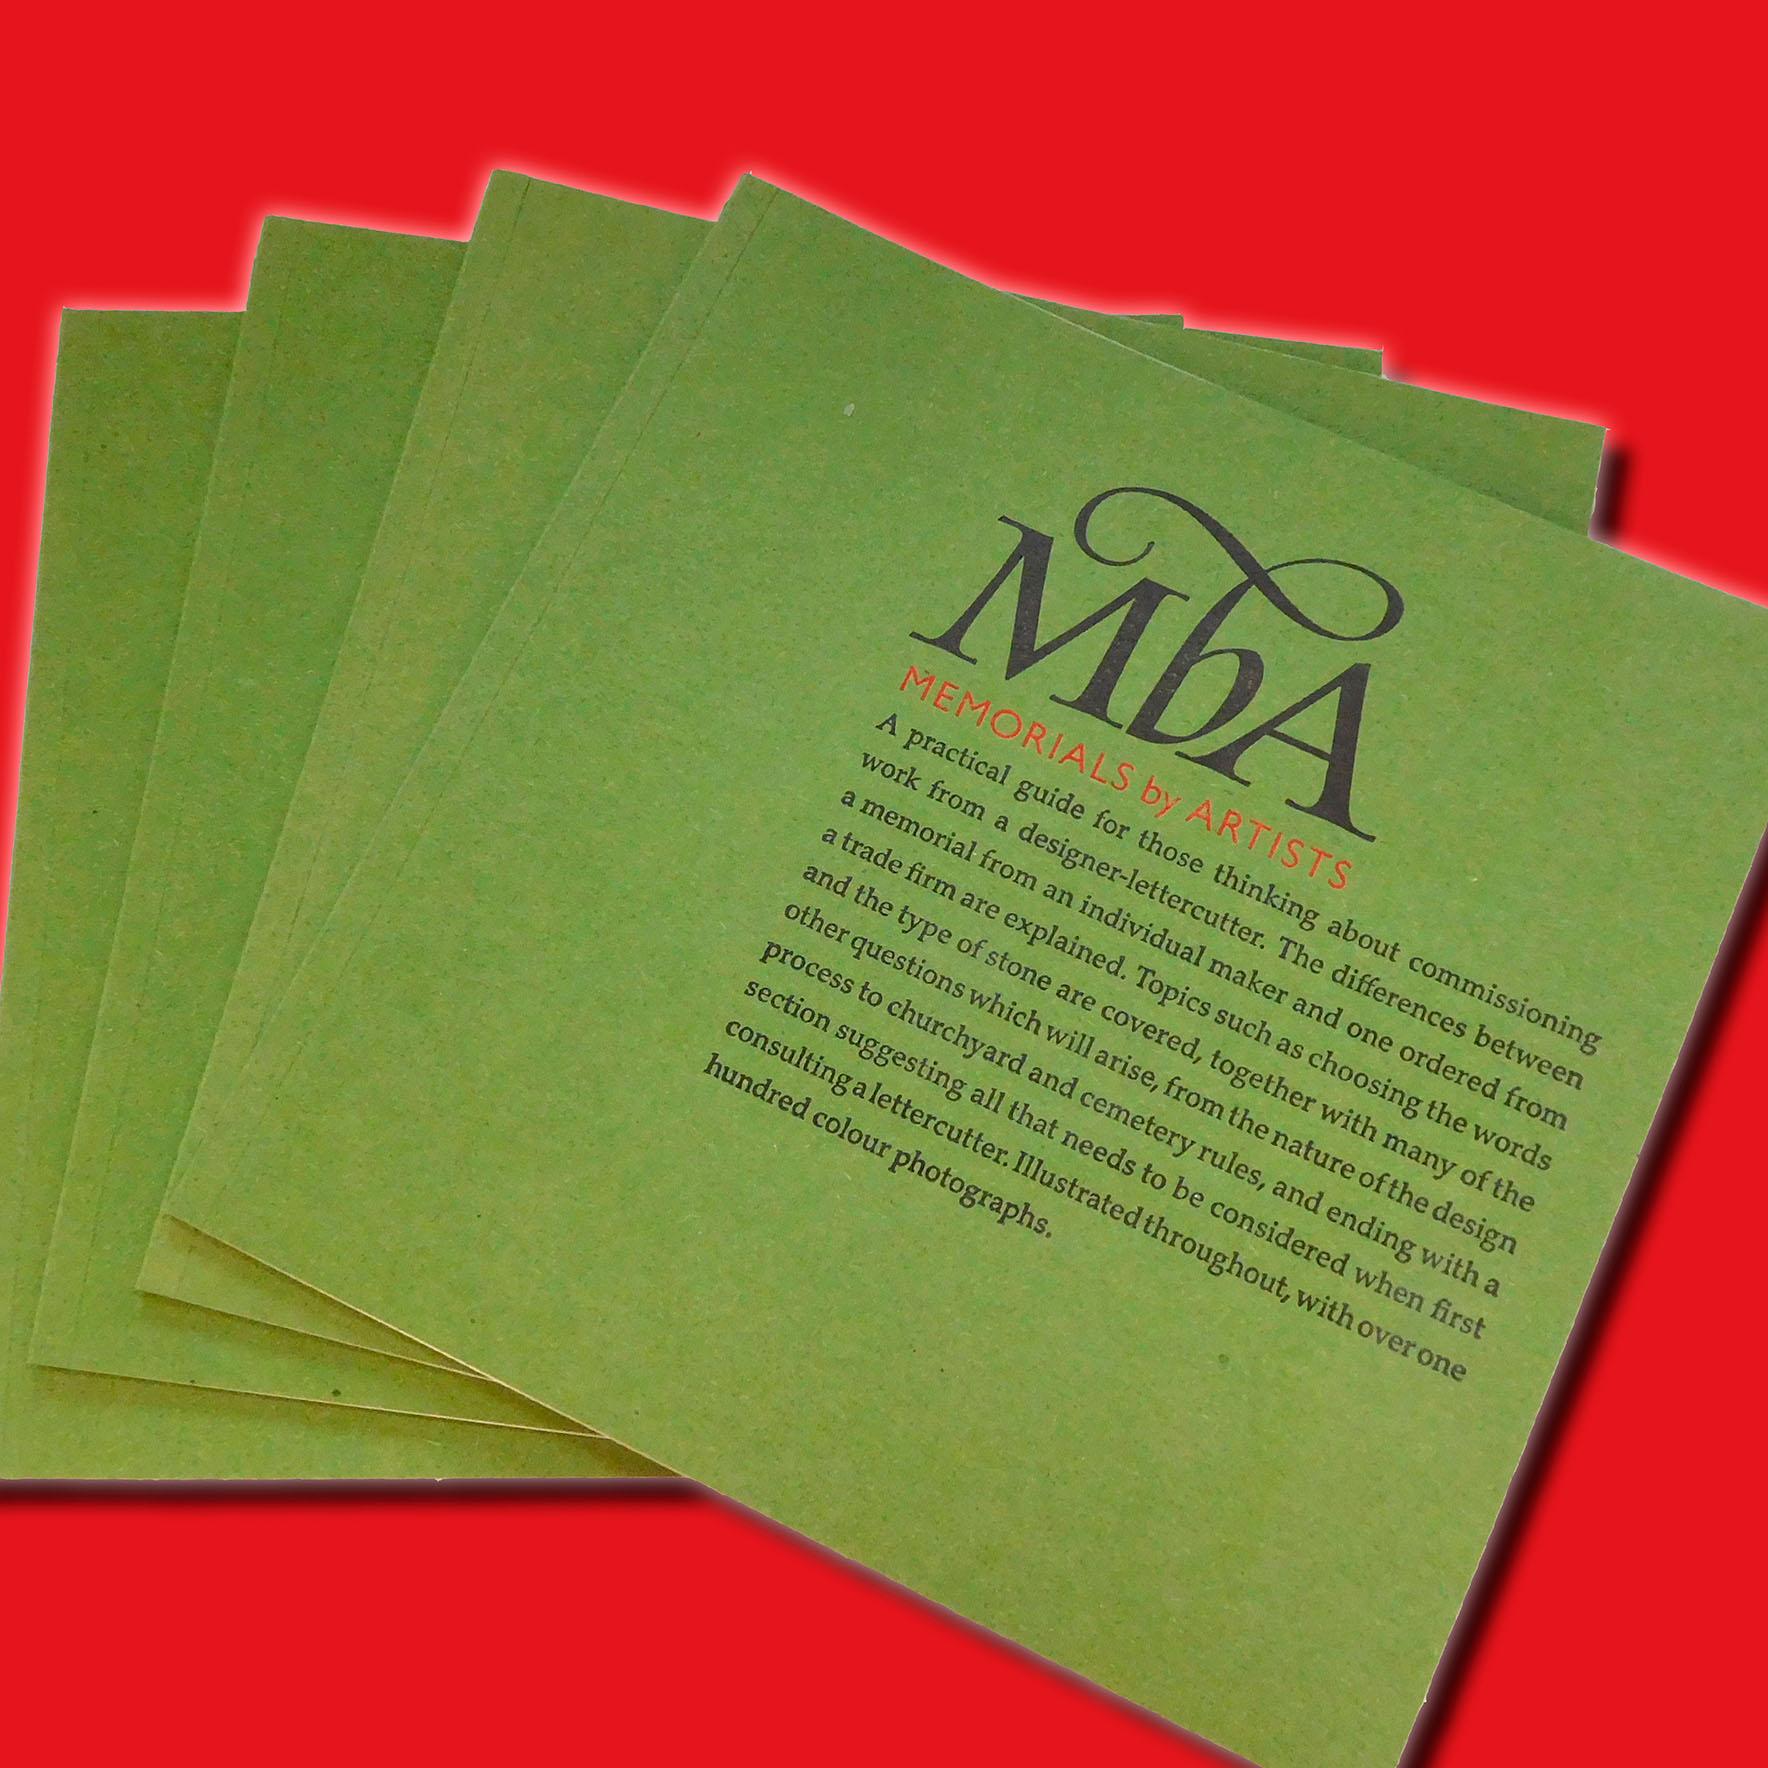 Lettering and Commemorative Arts Trust